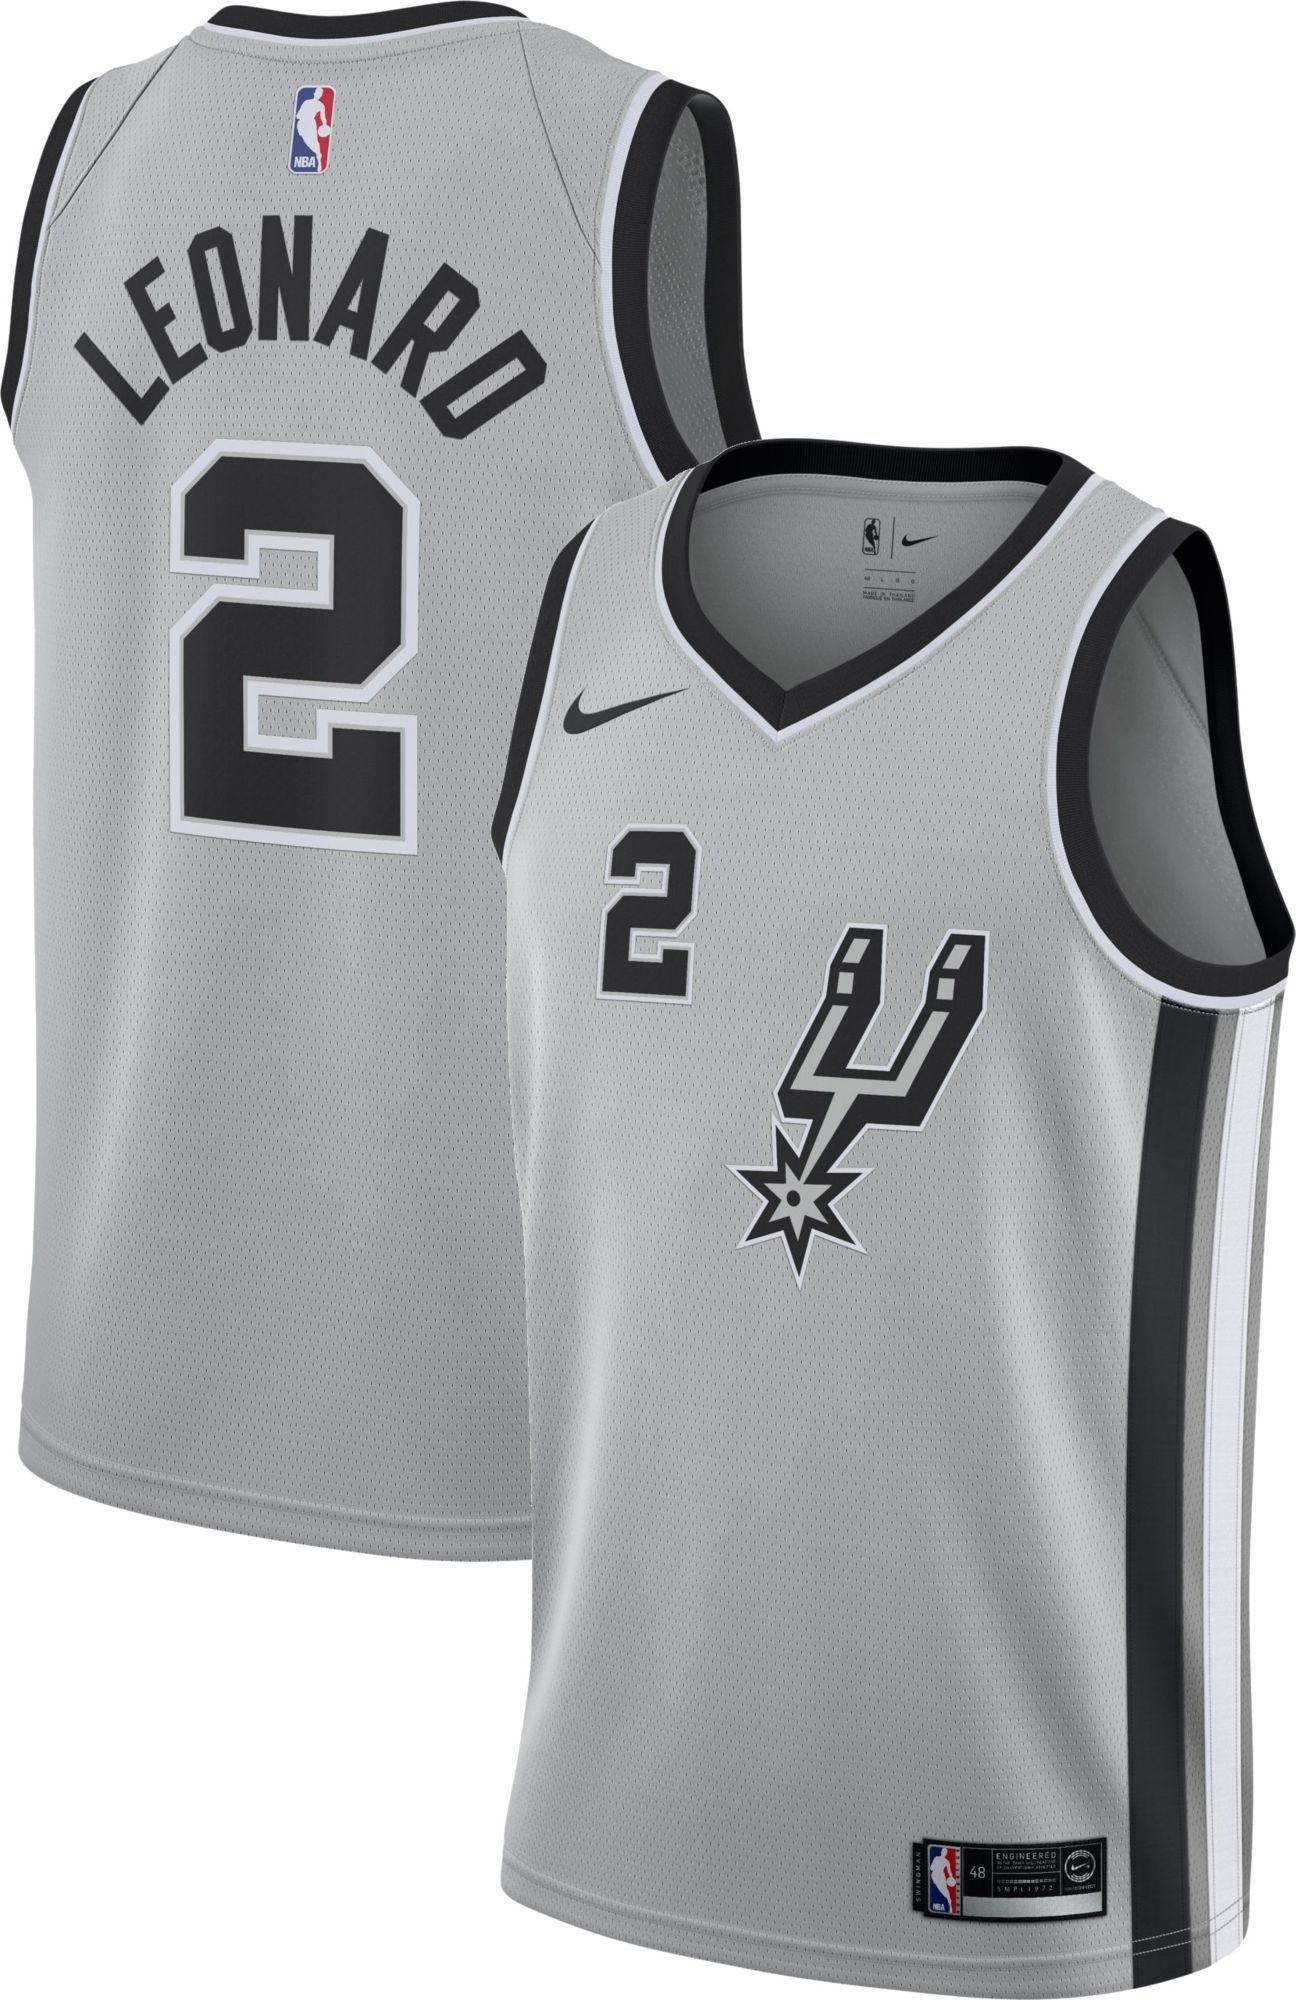 348c2455 Nike Men's San Antonio Spurs Kawhi Leonard #2 Grey Statement Dri-FIT  Swingman Jersey, Size: XXL, Team